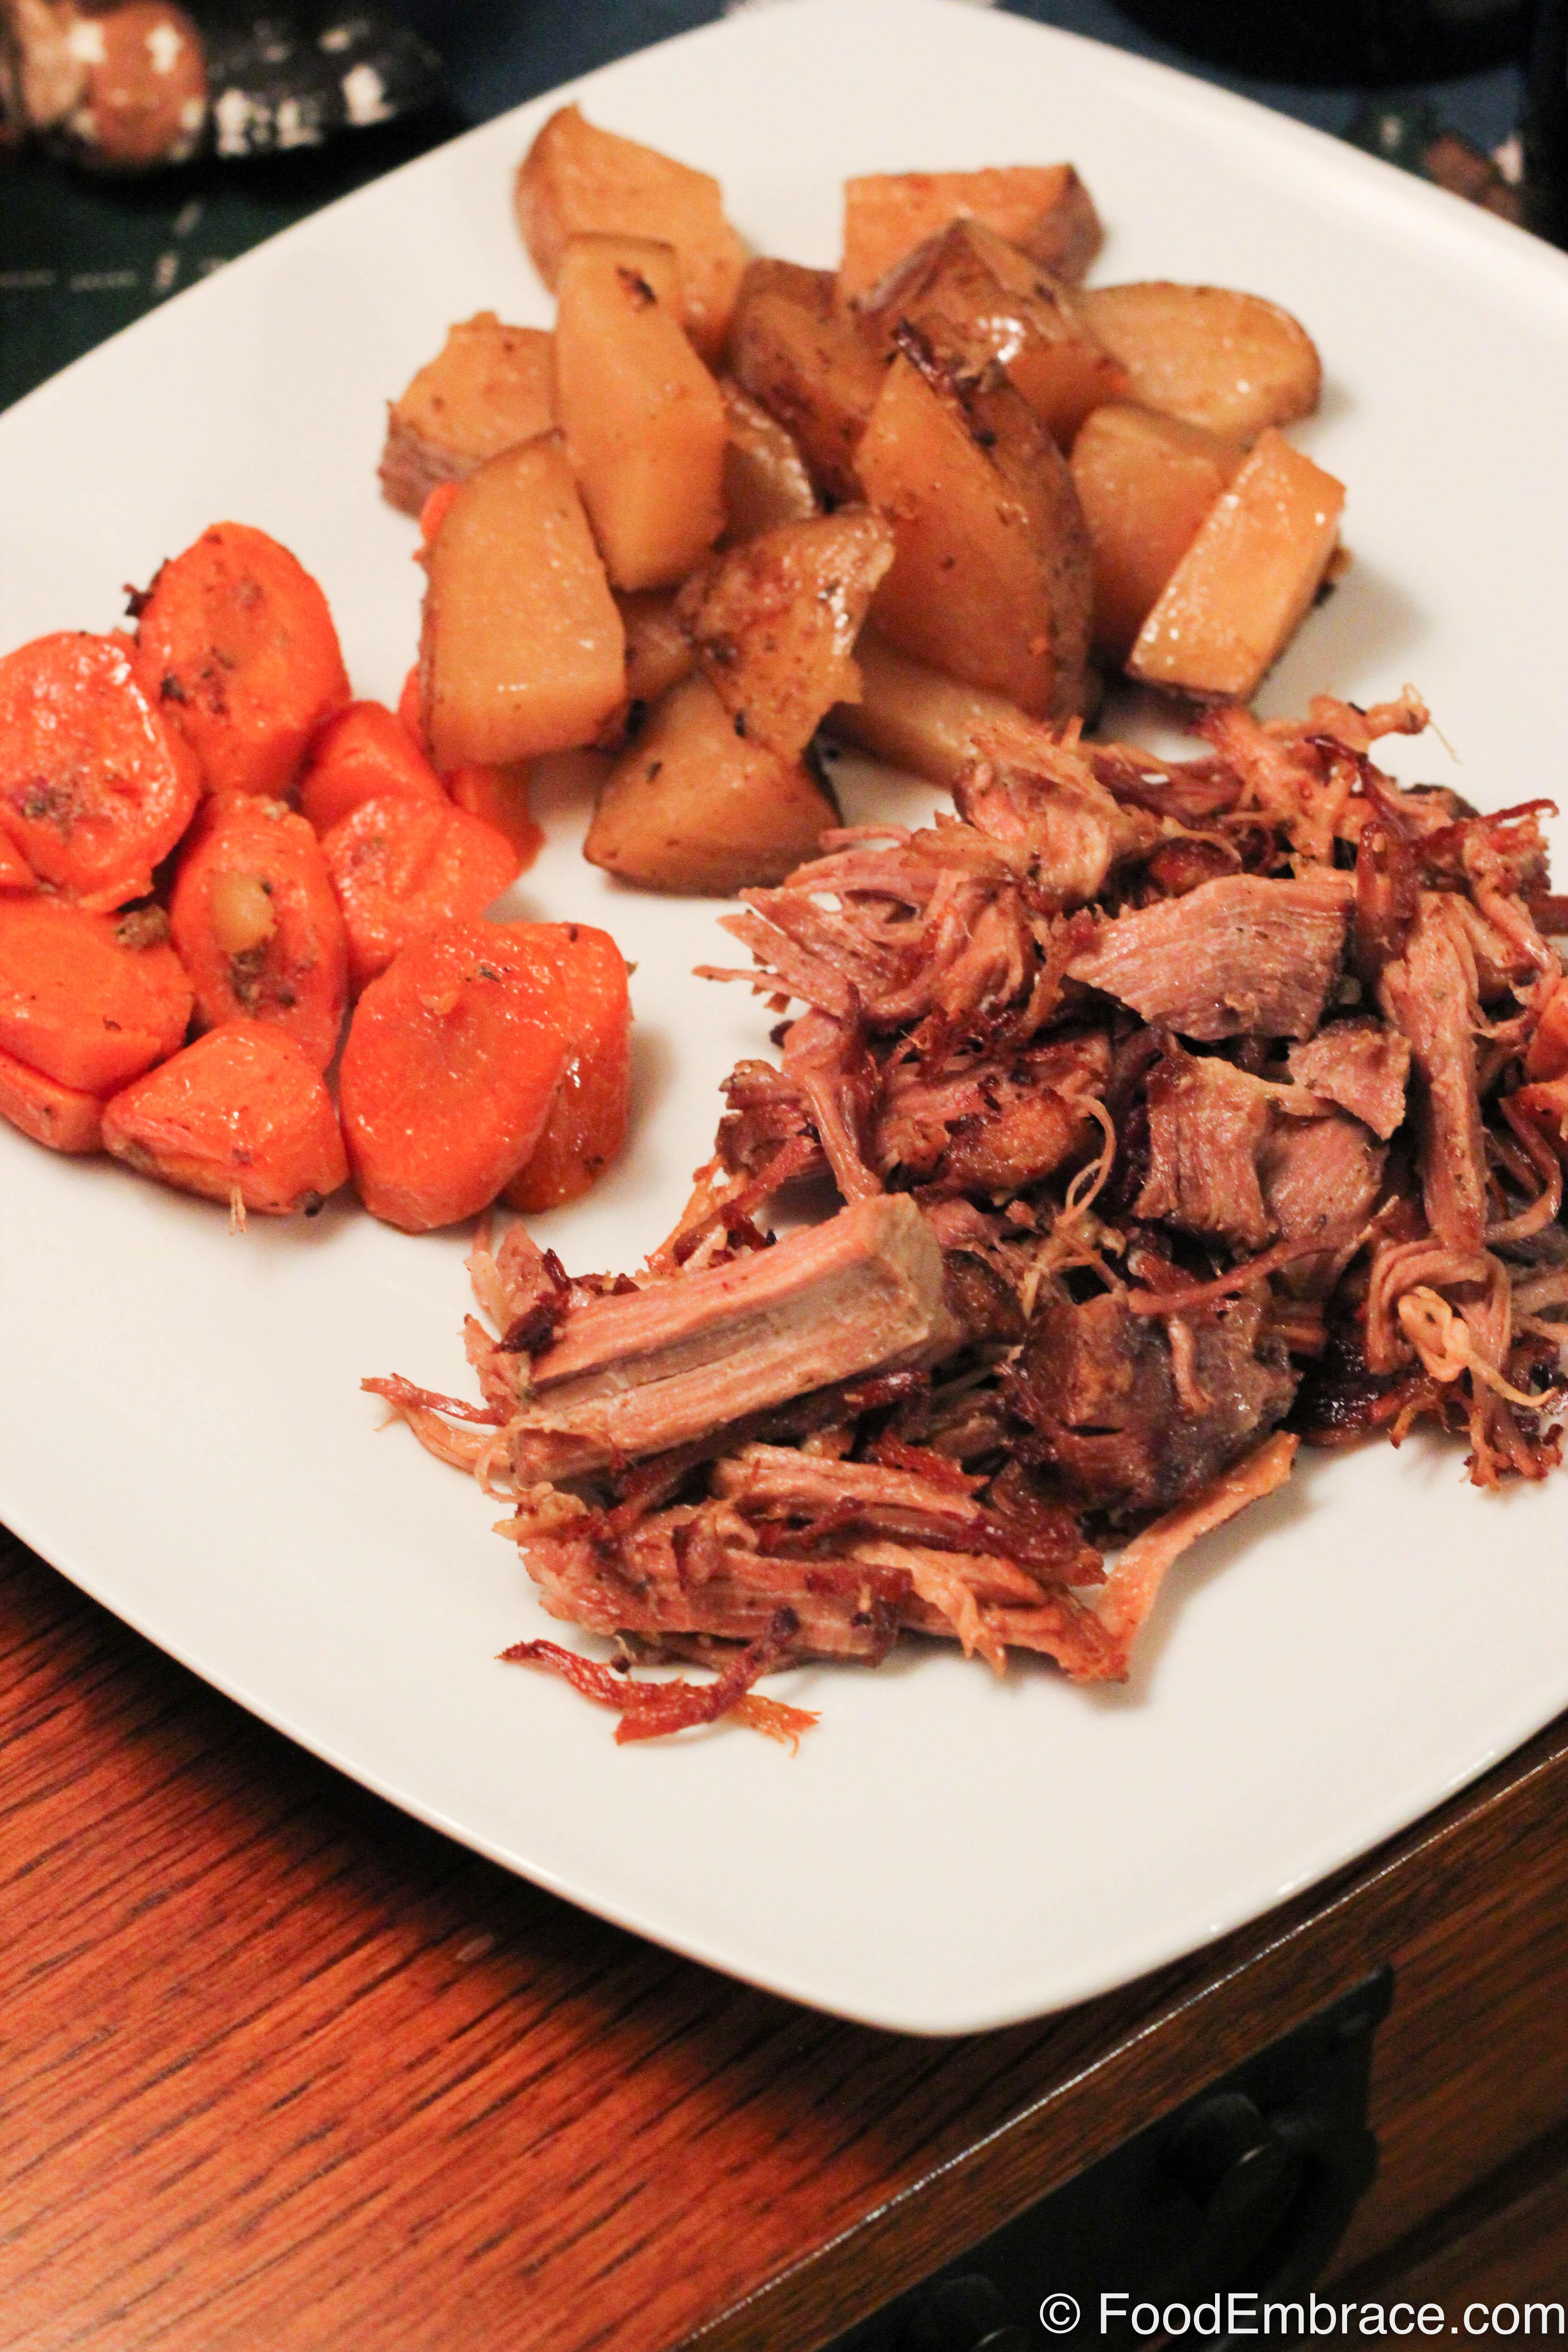 Crispy pork with potatoes and carrots.